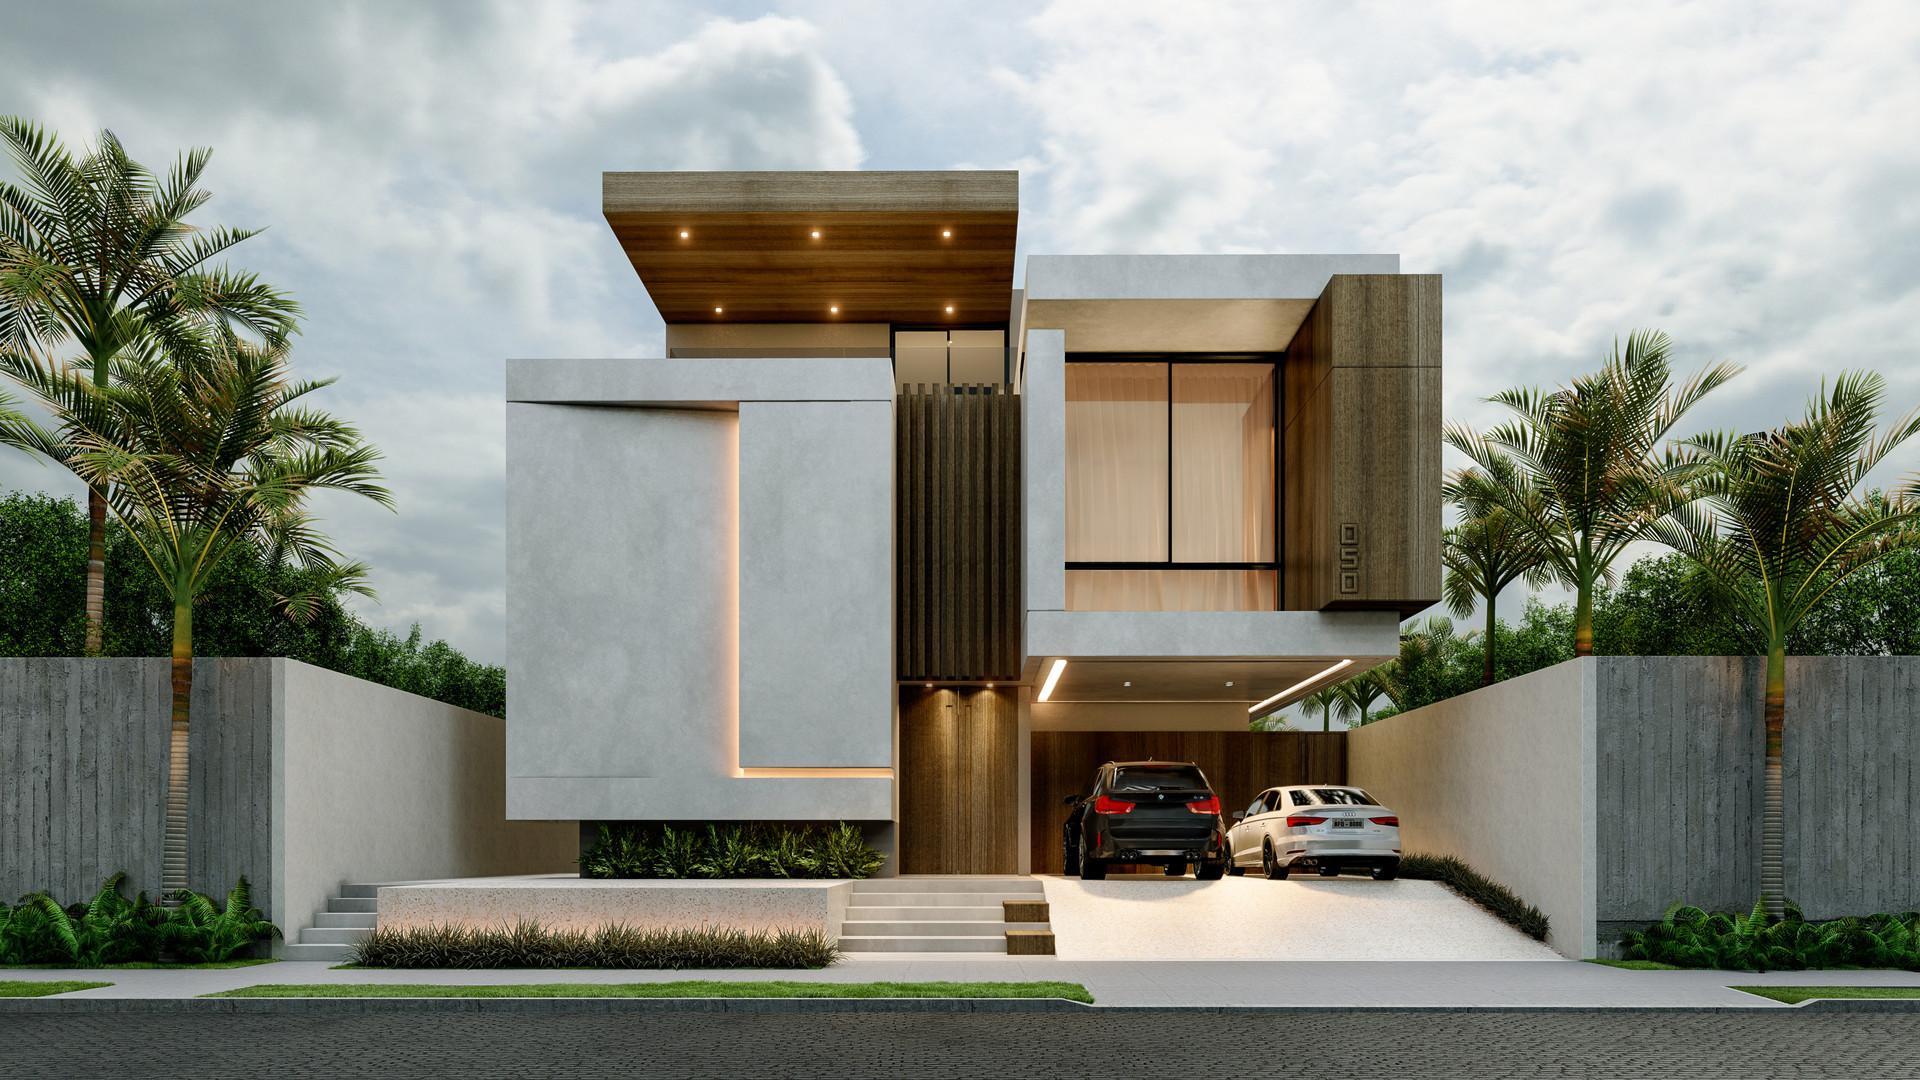 AL-ZAHMI HOUSE